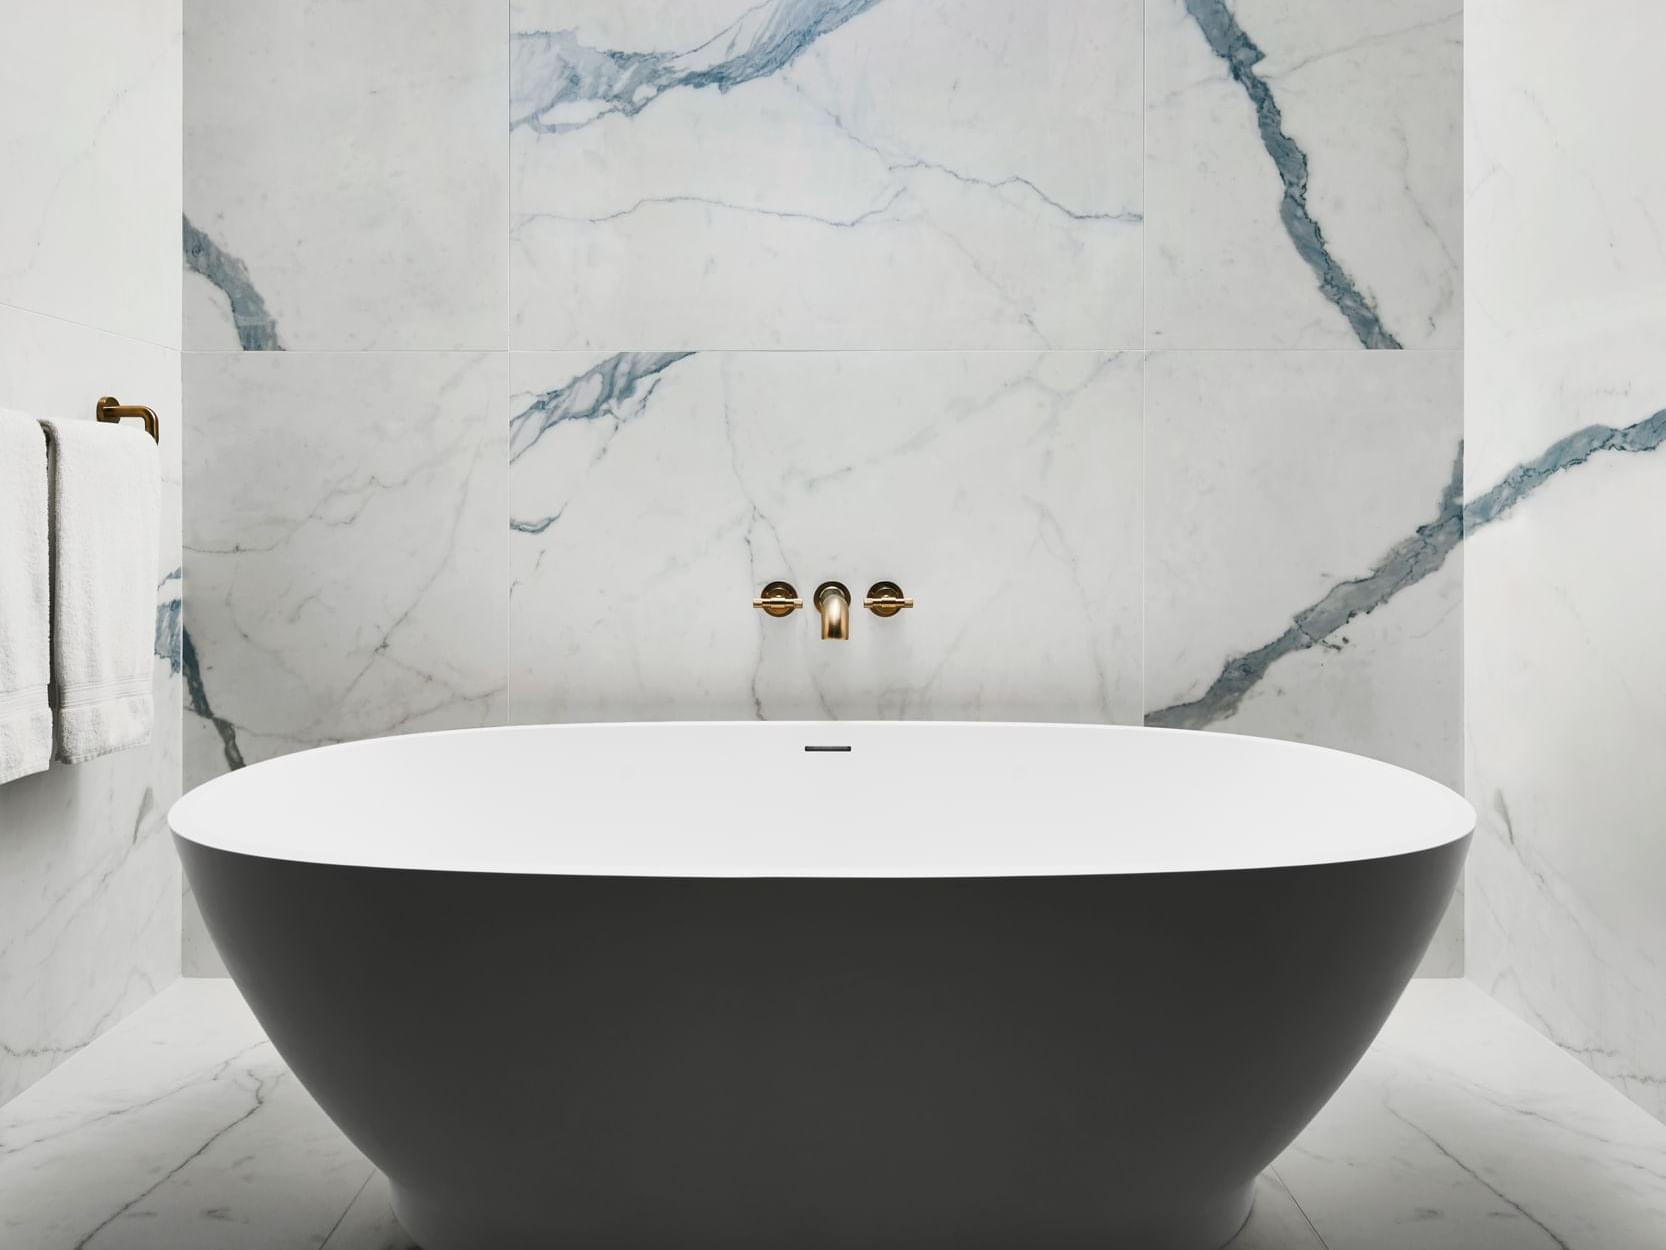 Poliform Penthouse Soak Tub